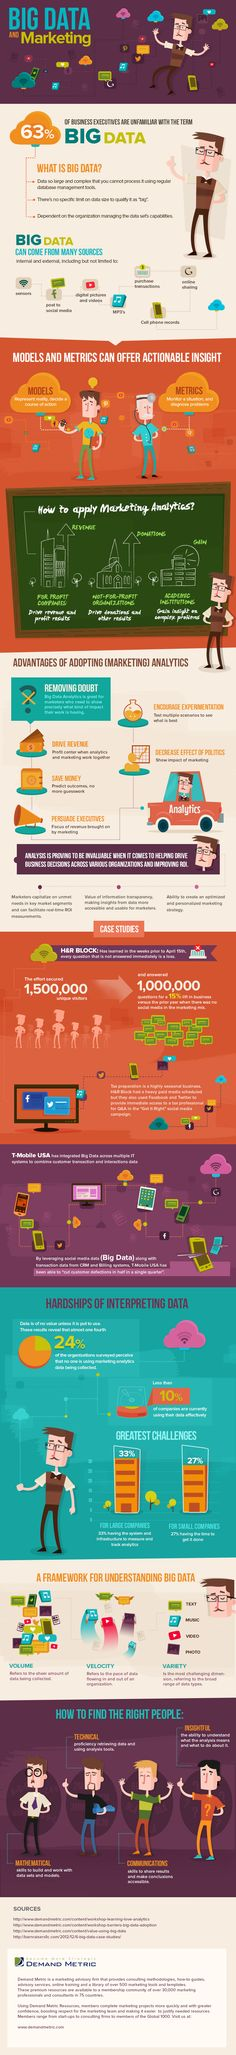 Big Data and Marketing [Infographic]